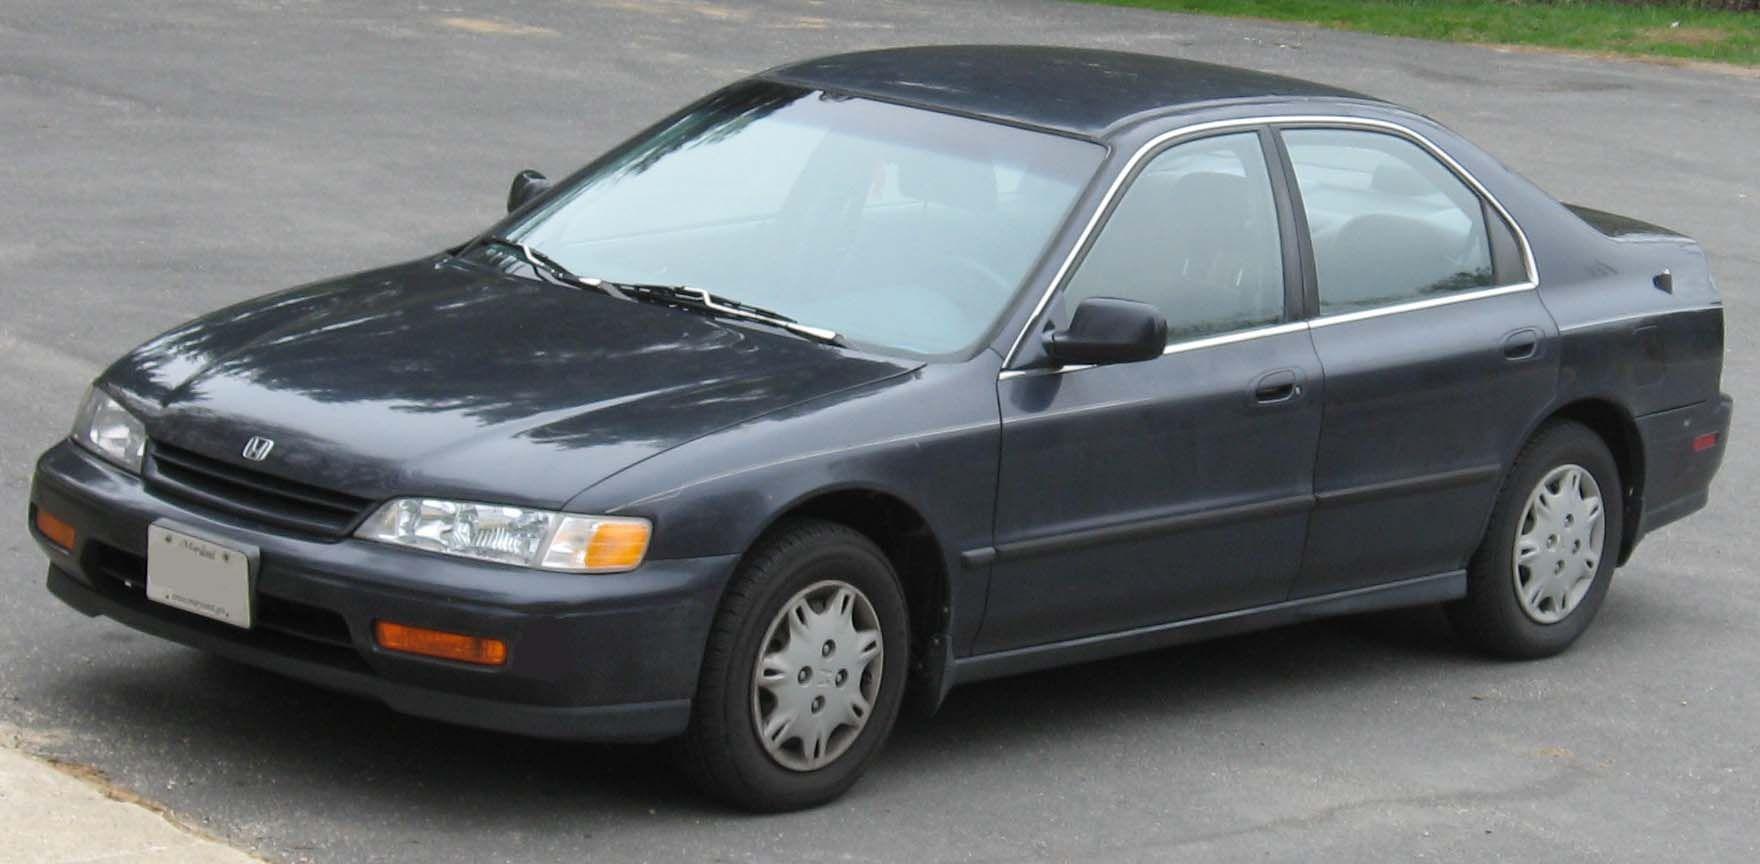 19941995 Honda Accord. Honda accord, Honda, Fun facts